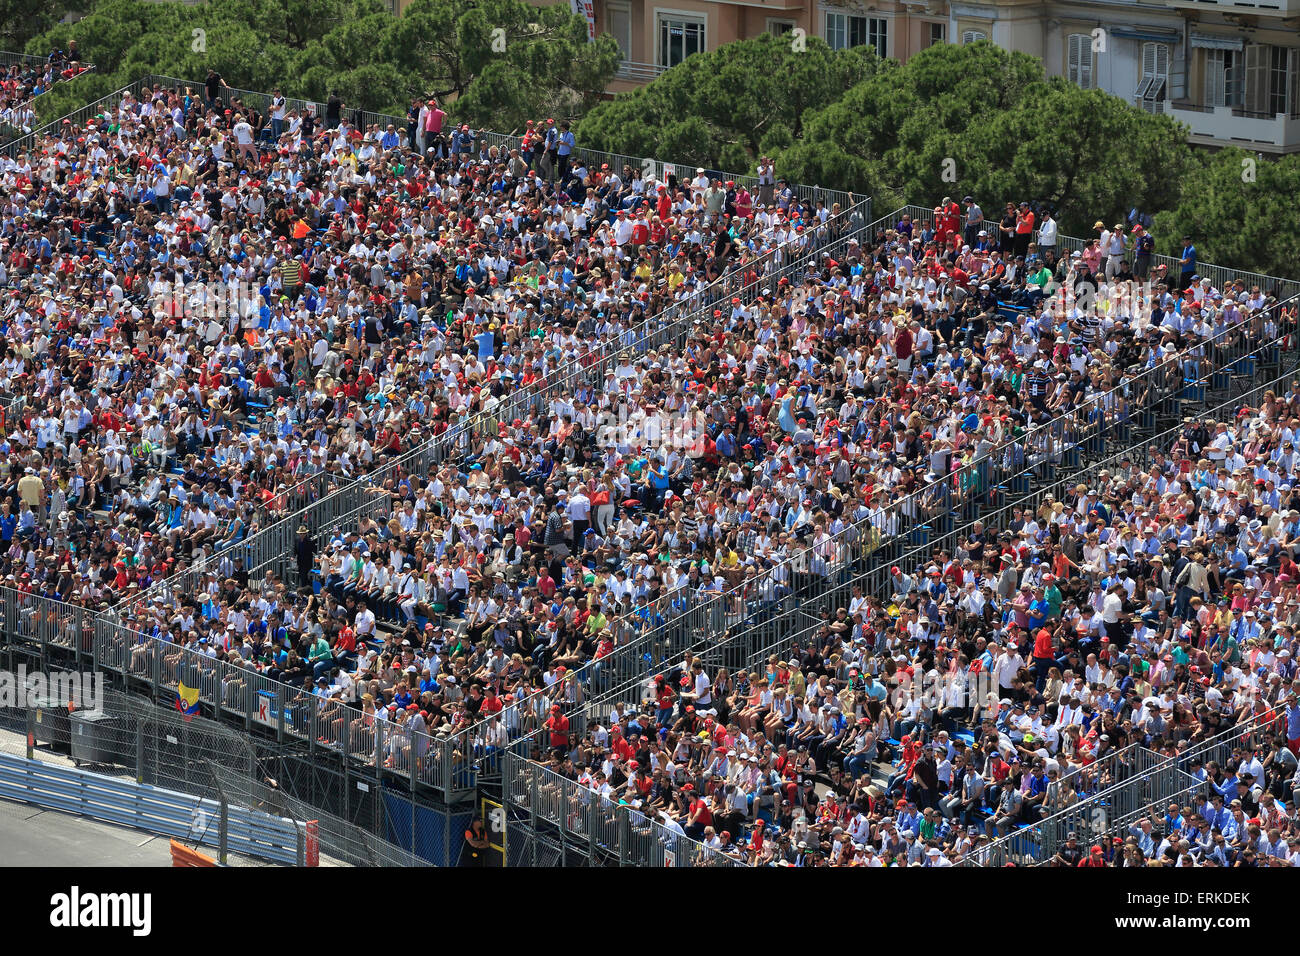 Grandstand at Port Hercule, Formula 1 Grand Prix Monaco 2015, Principality of Monaco - Stock Image